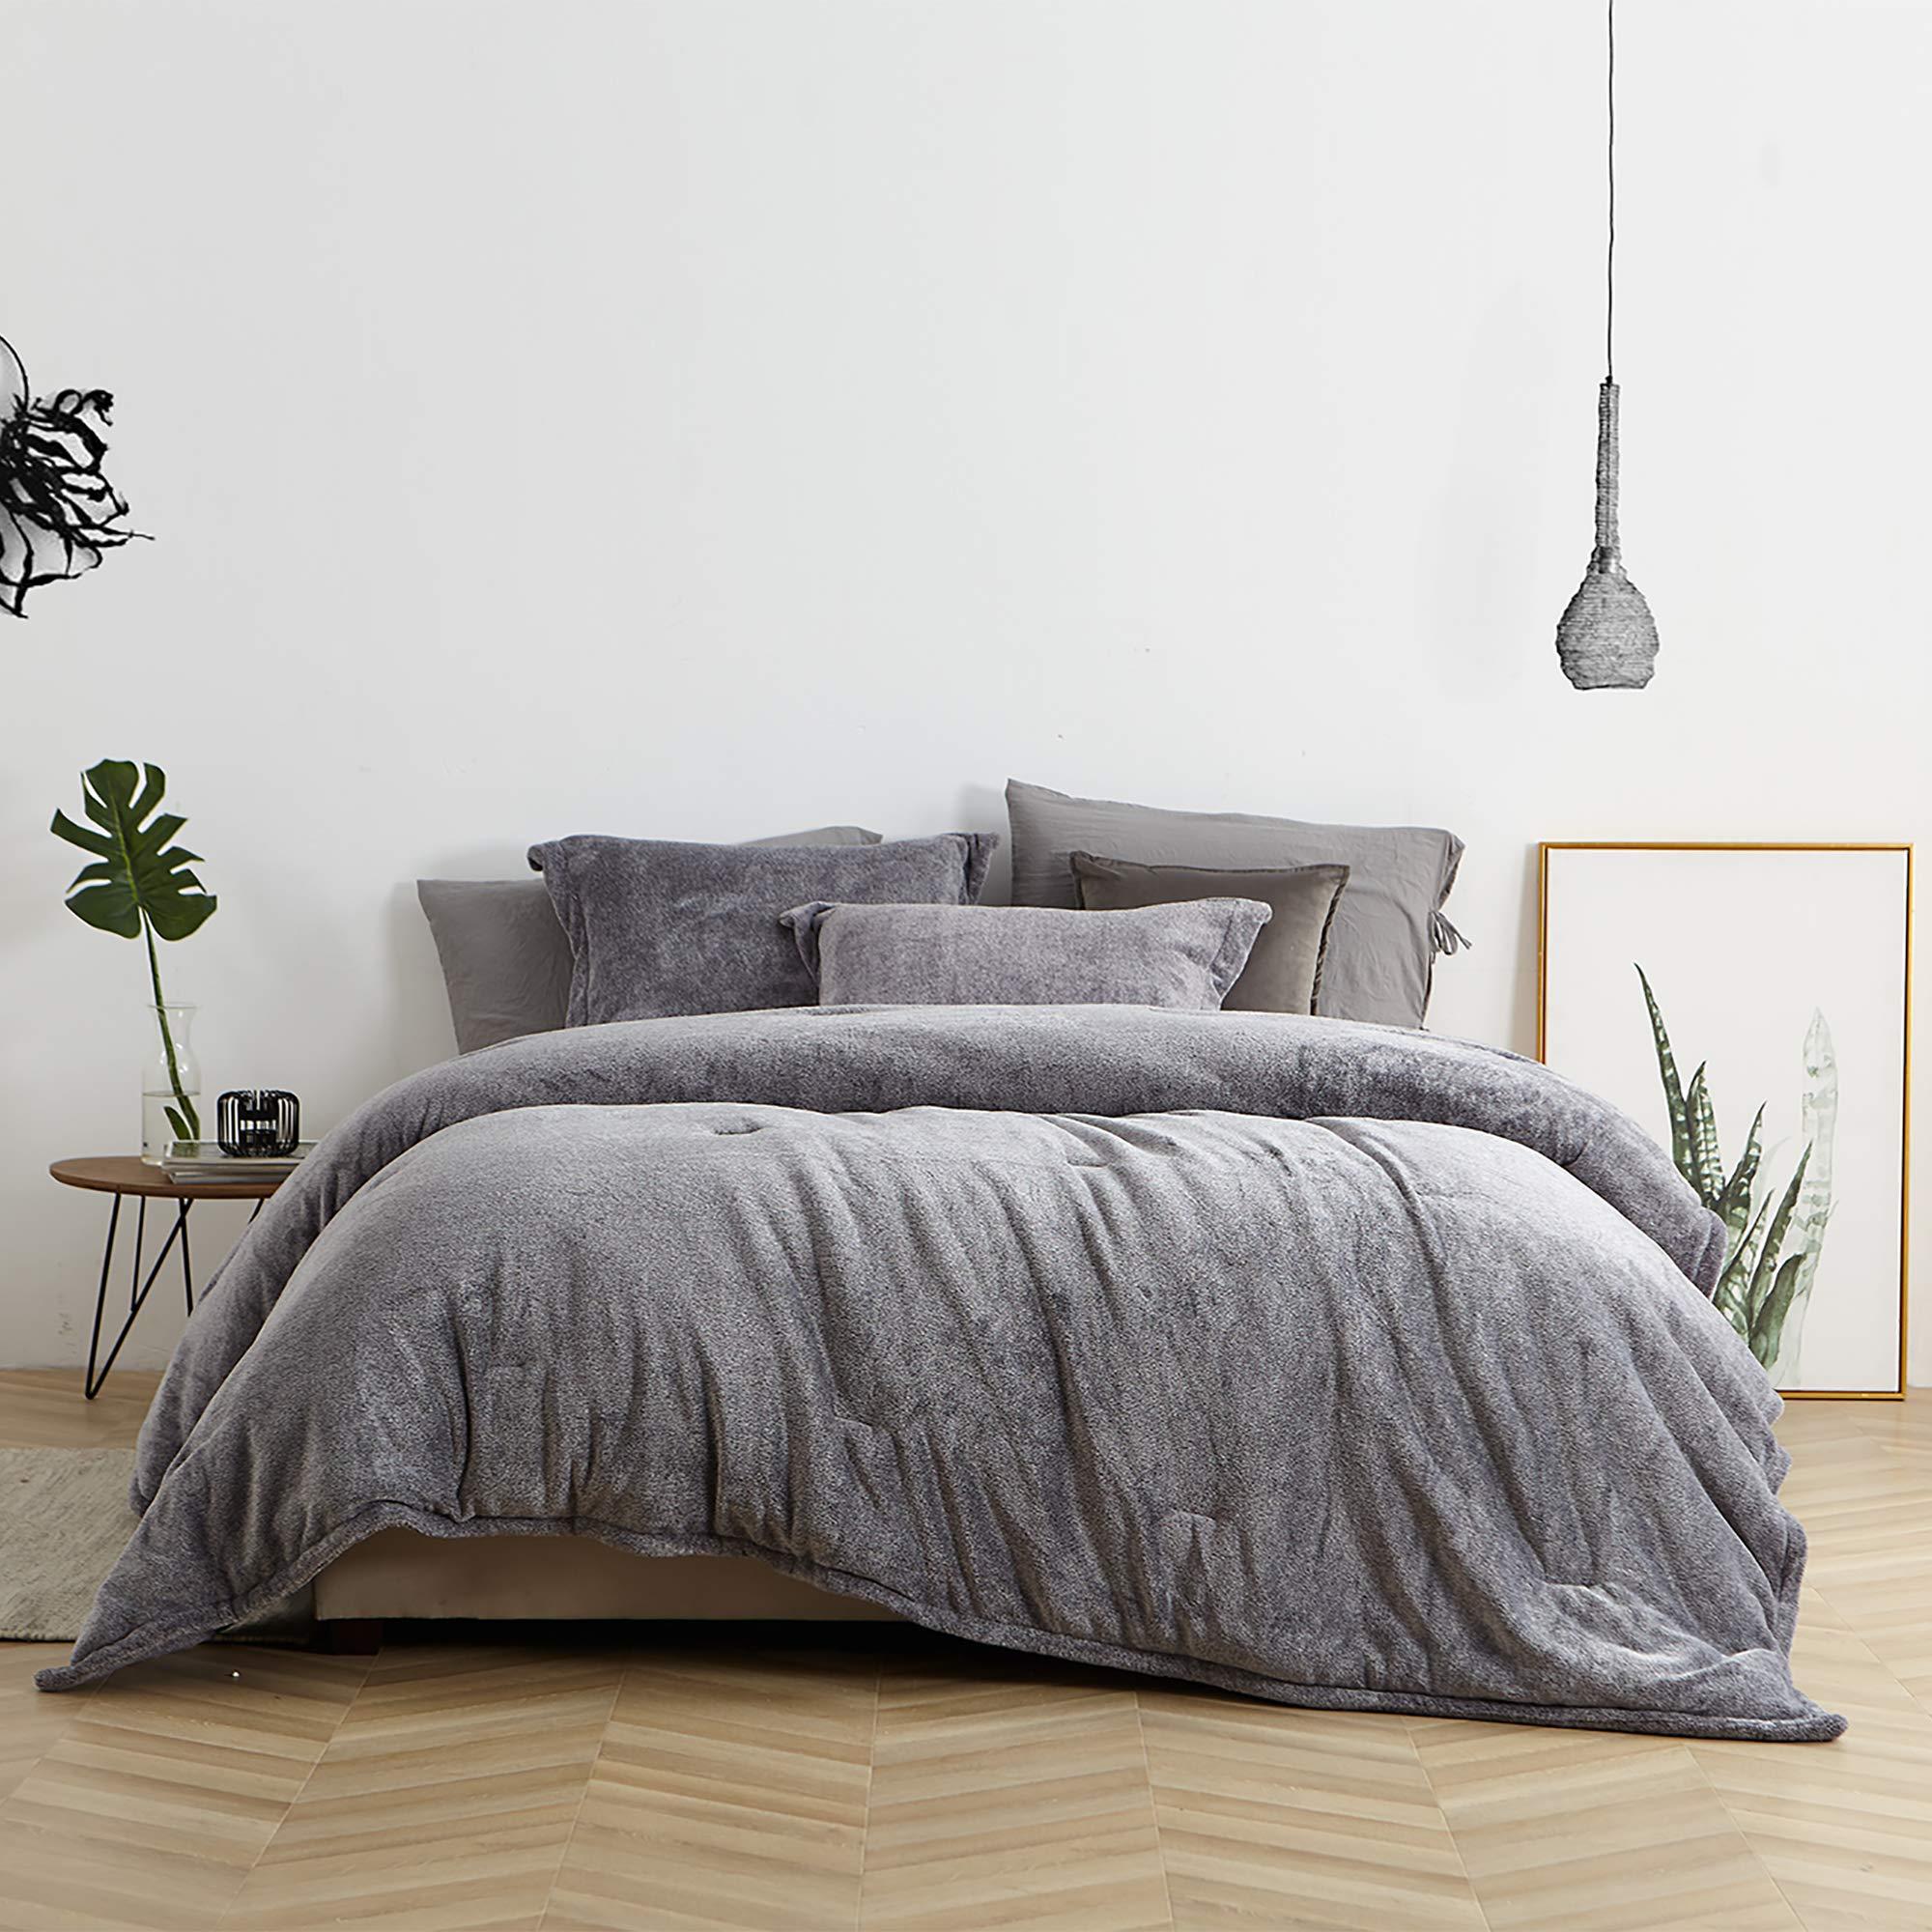 Byourbed Coma Inducer Oversized King Comforter - UB-Jealy - Slate Black